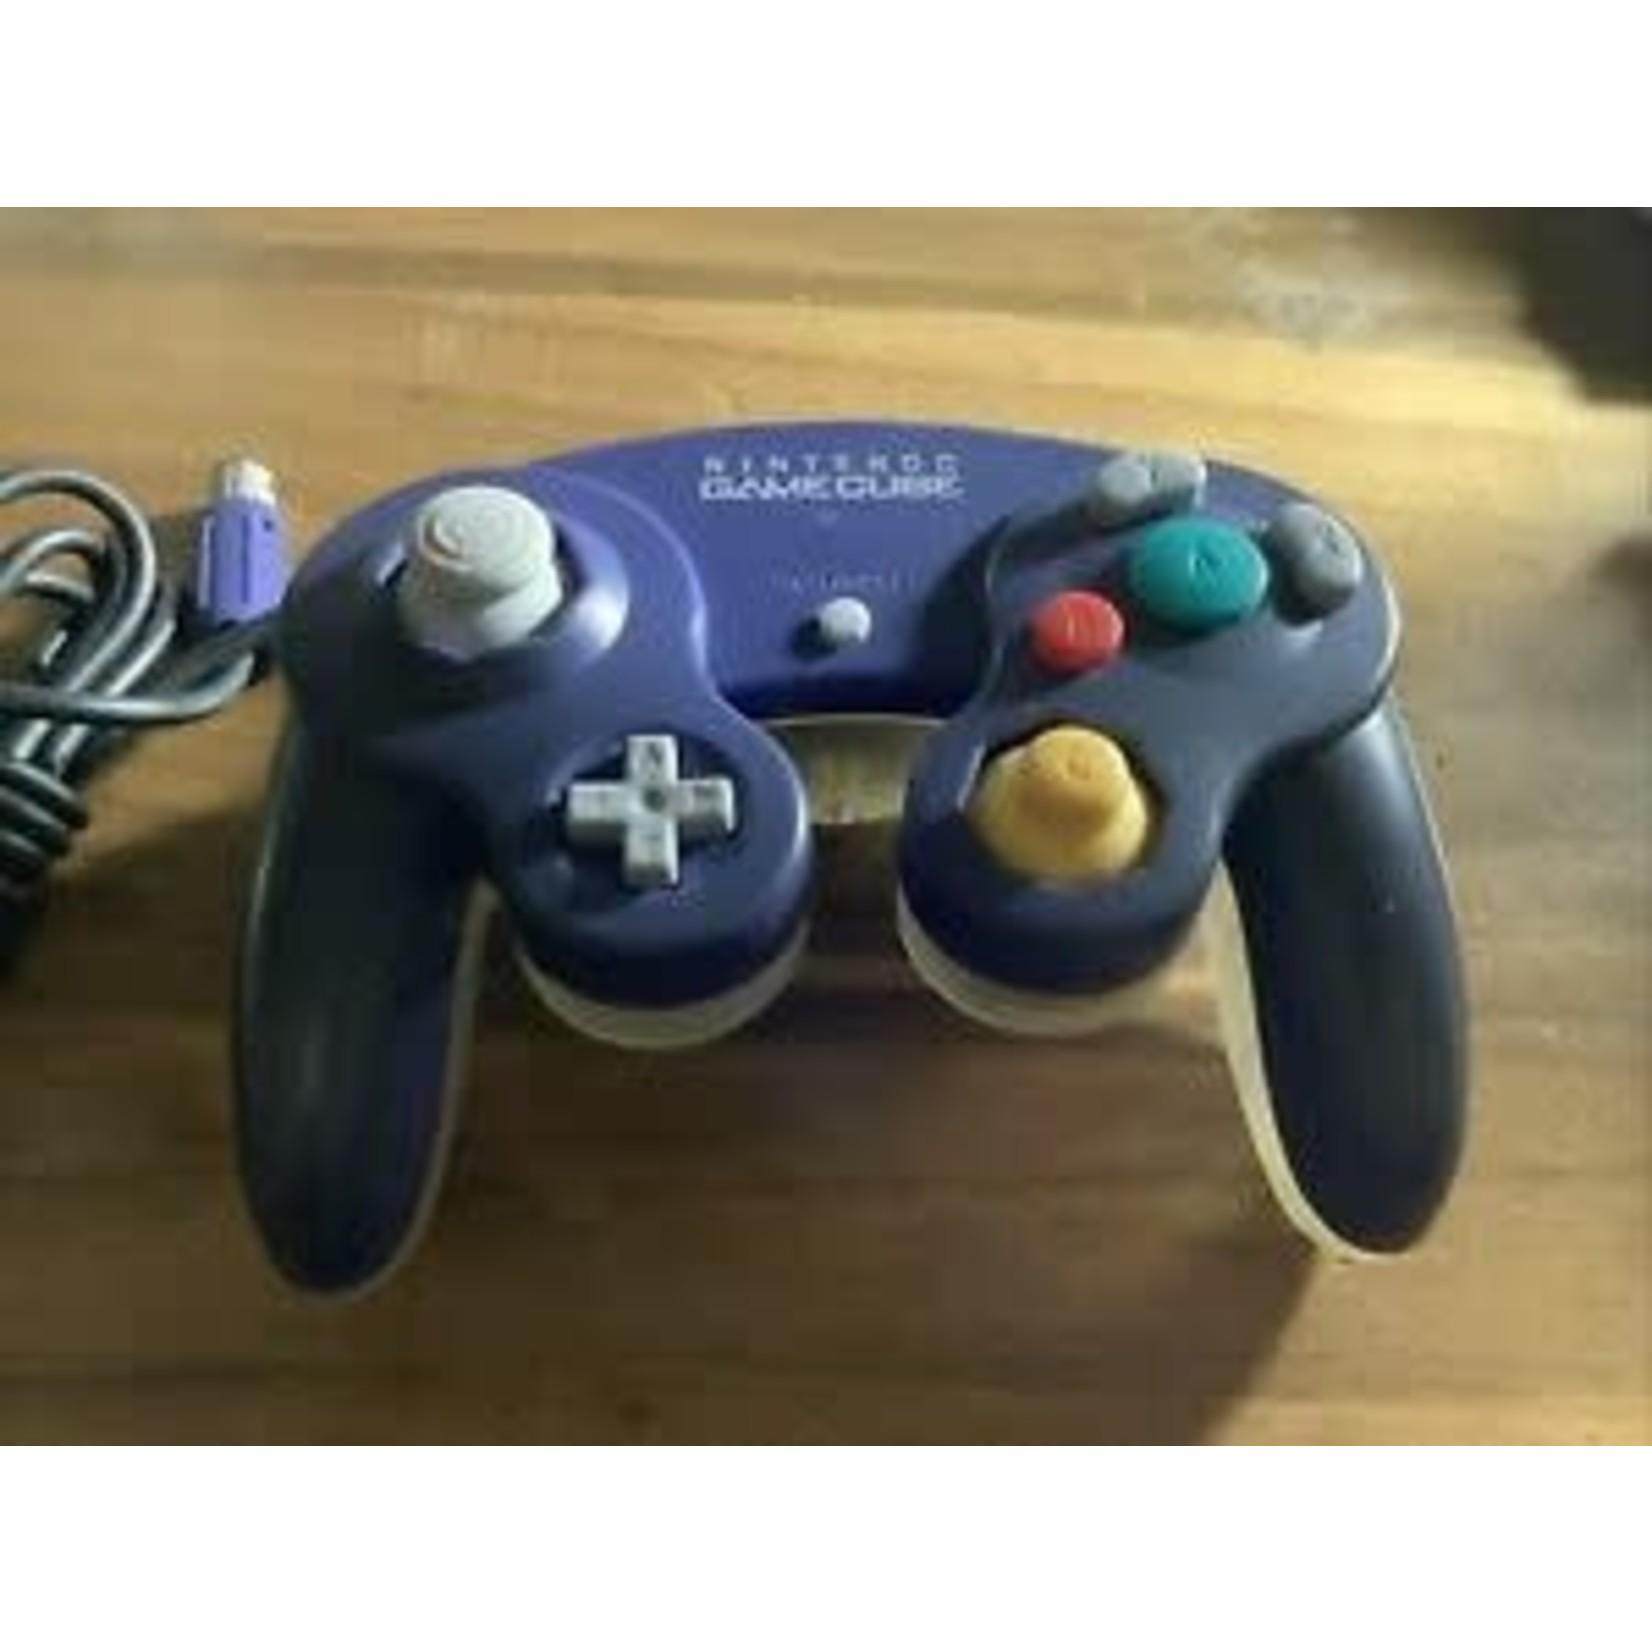 GCU-Used dual color Gamecube controller Violet/Clear